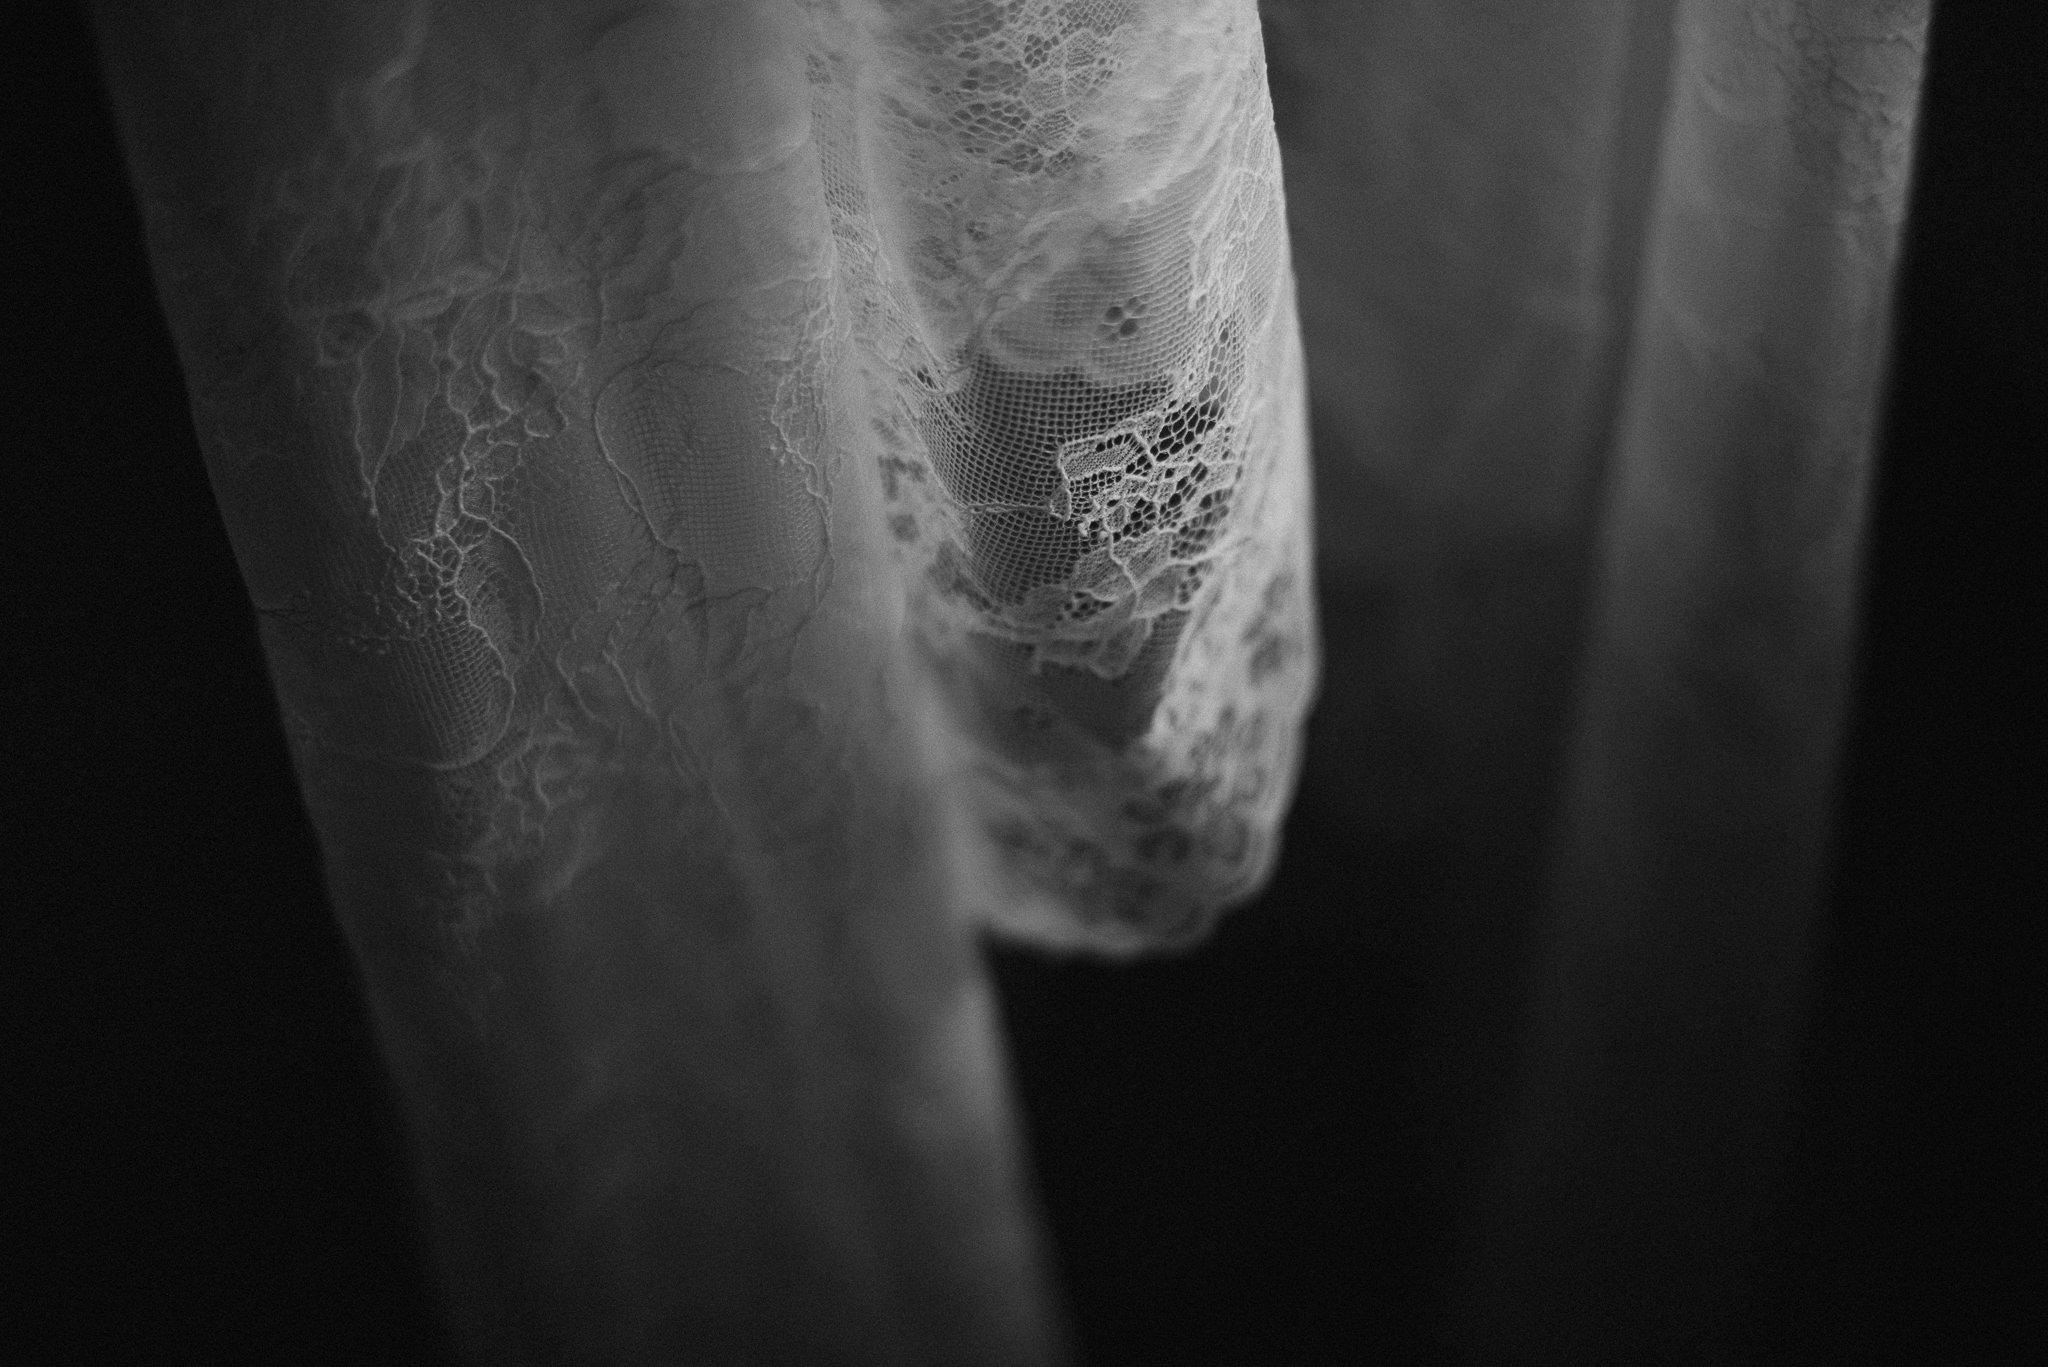 Moody winterbruiloft - Naomi van der Kraan - 02.jpg